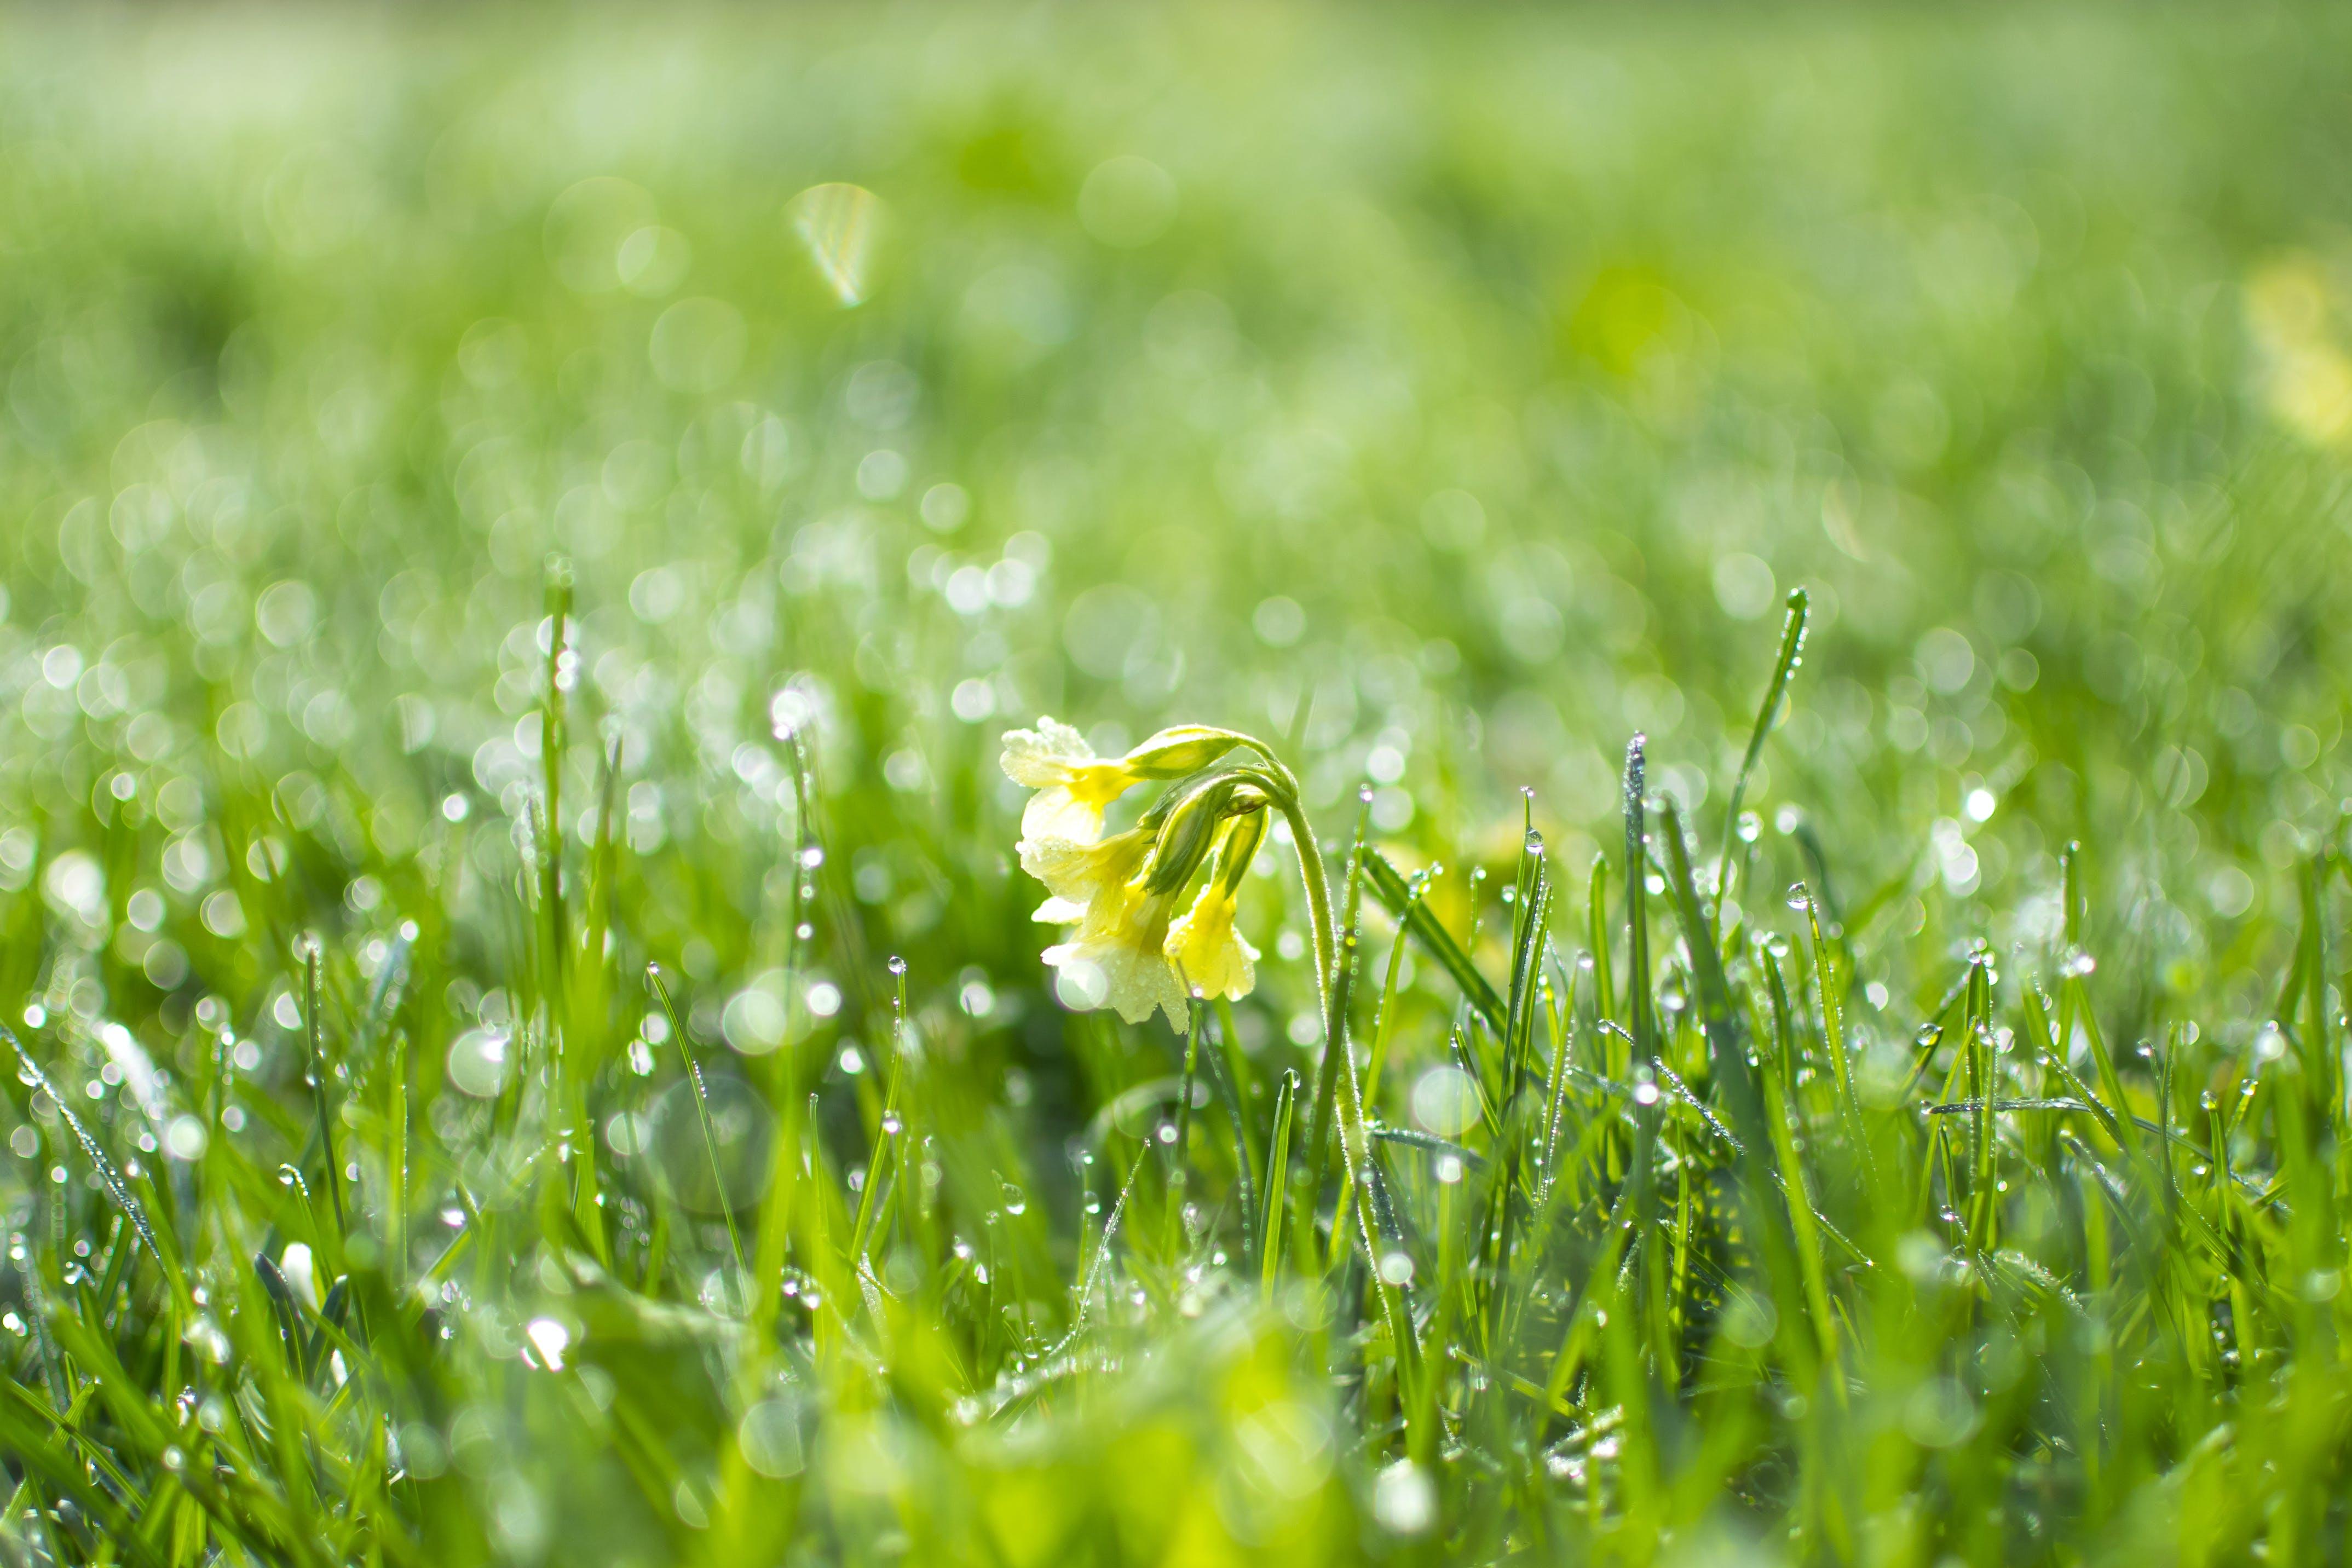 Green Grass at Daytime · Free Stock Photo